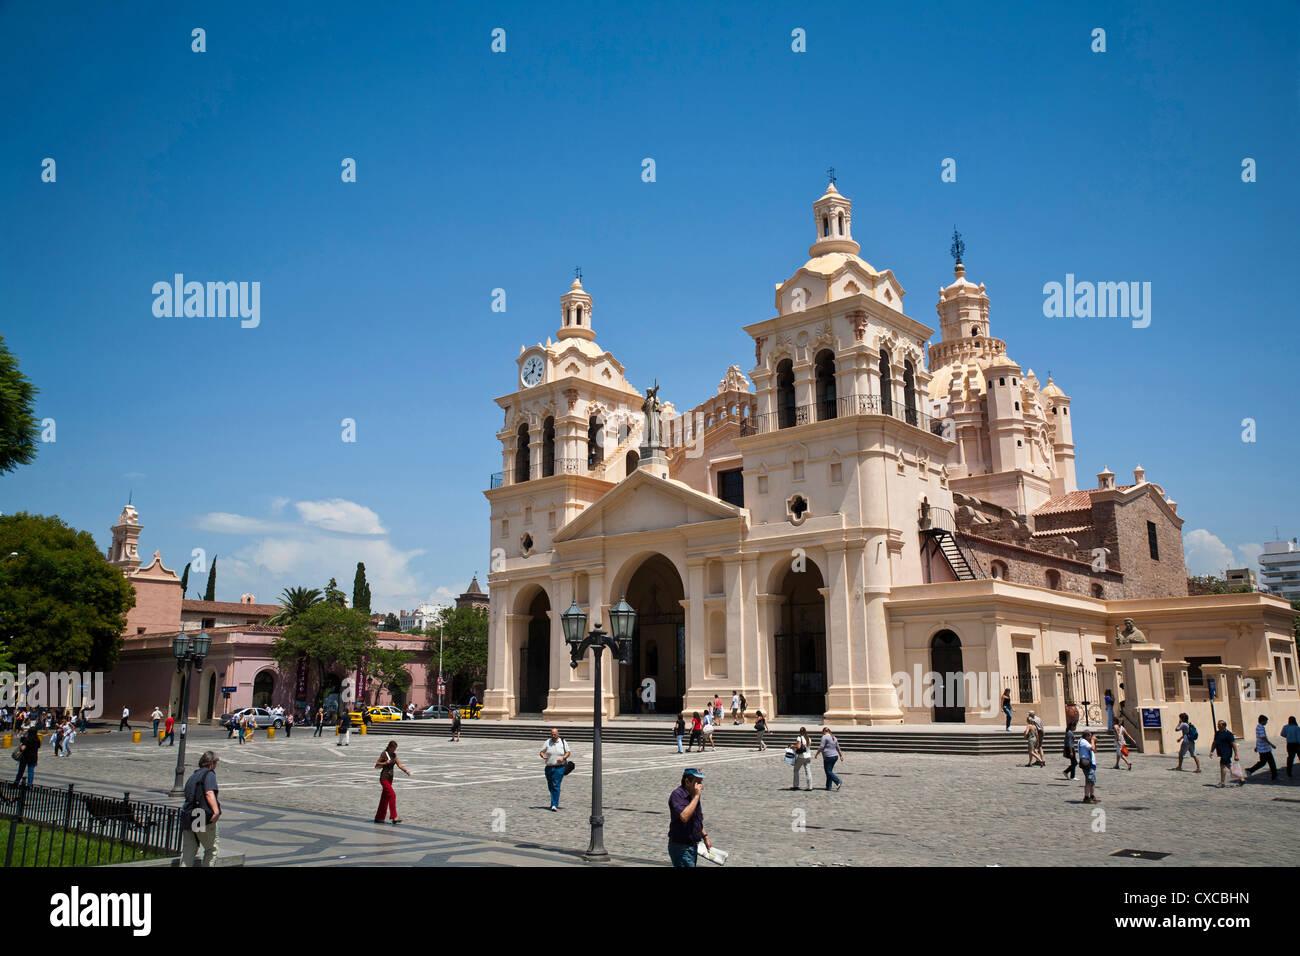 Iglesia Catedral at Plaza San Martin, Cordoba City, Cordoba Province, Argentina. Stock Photo